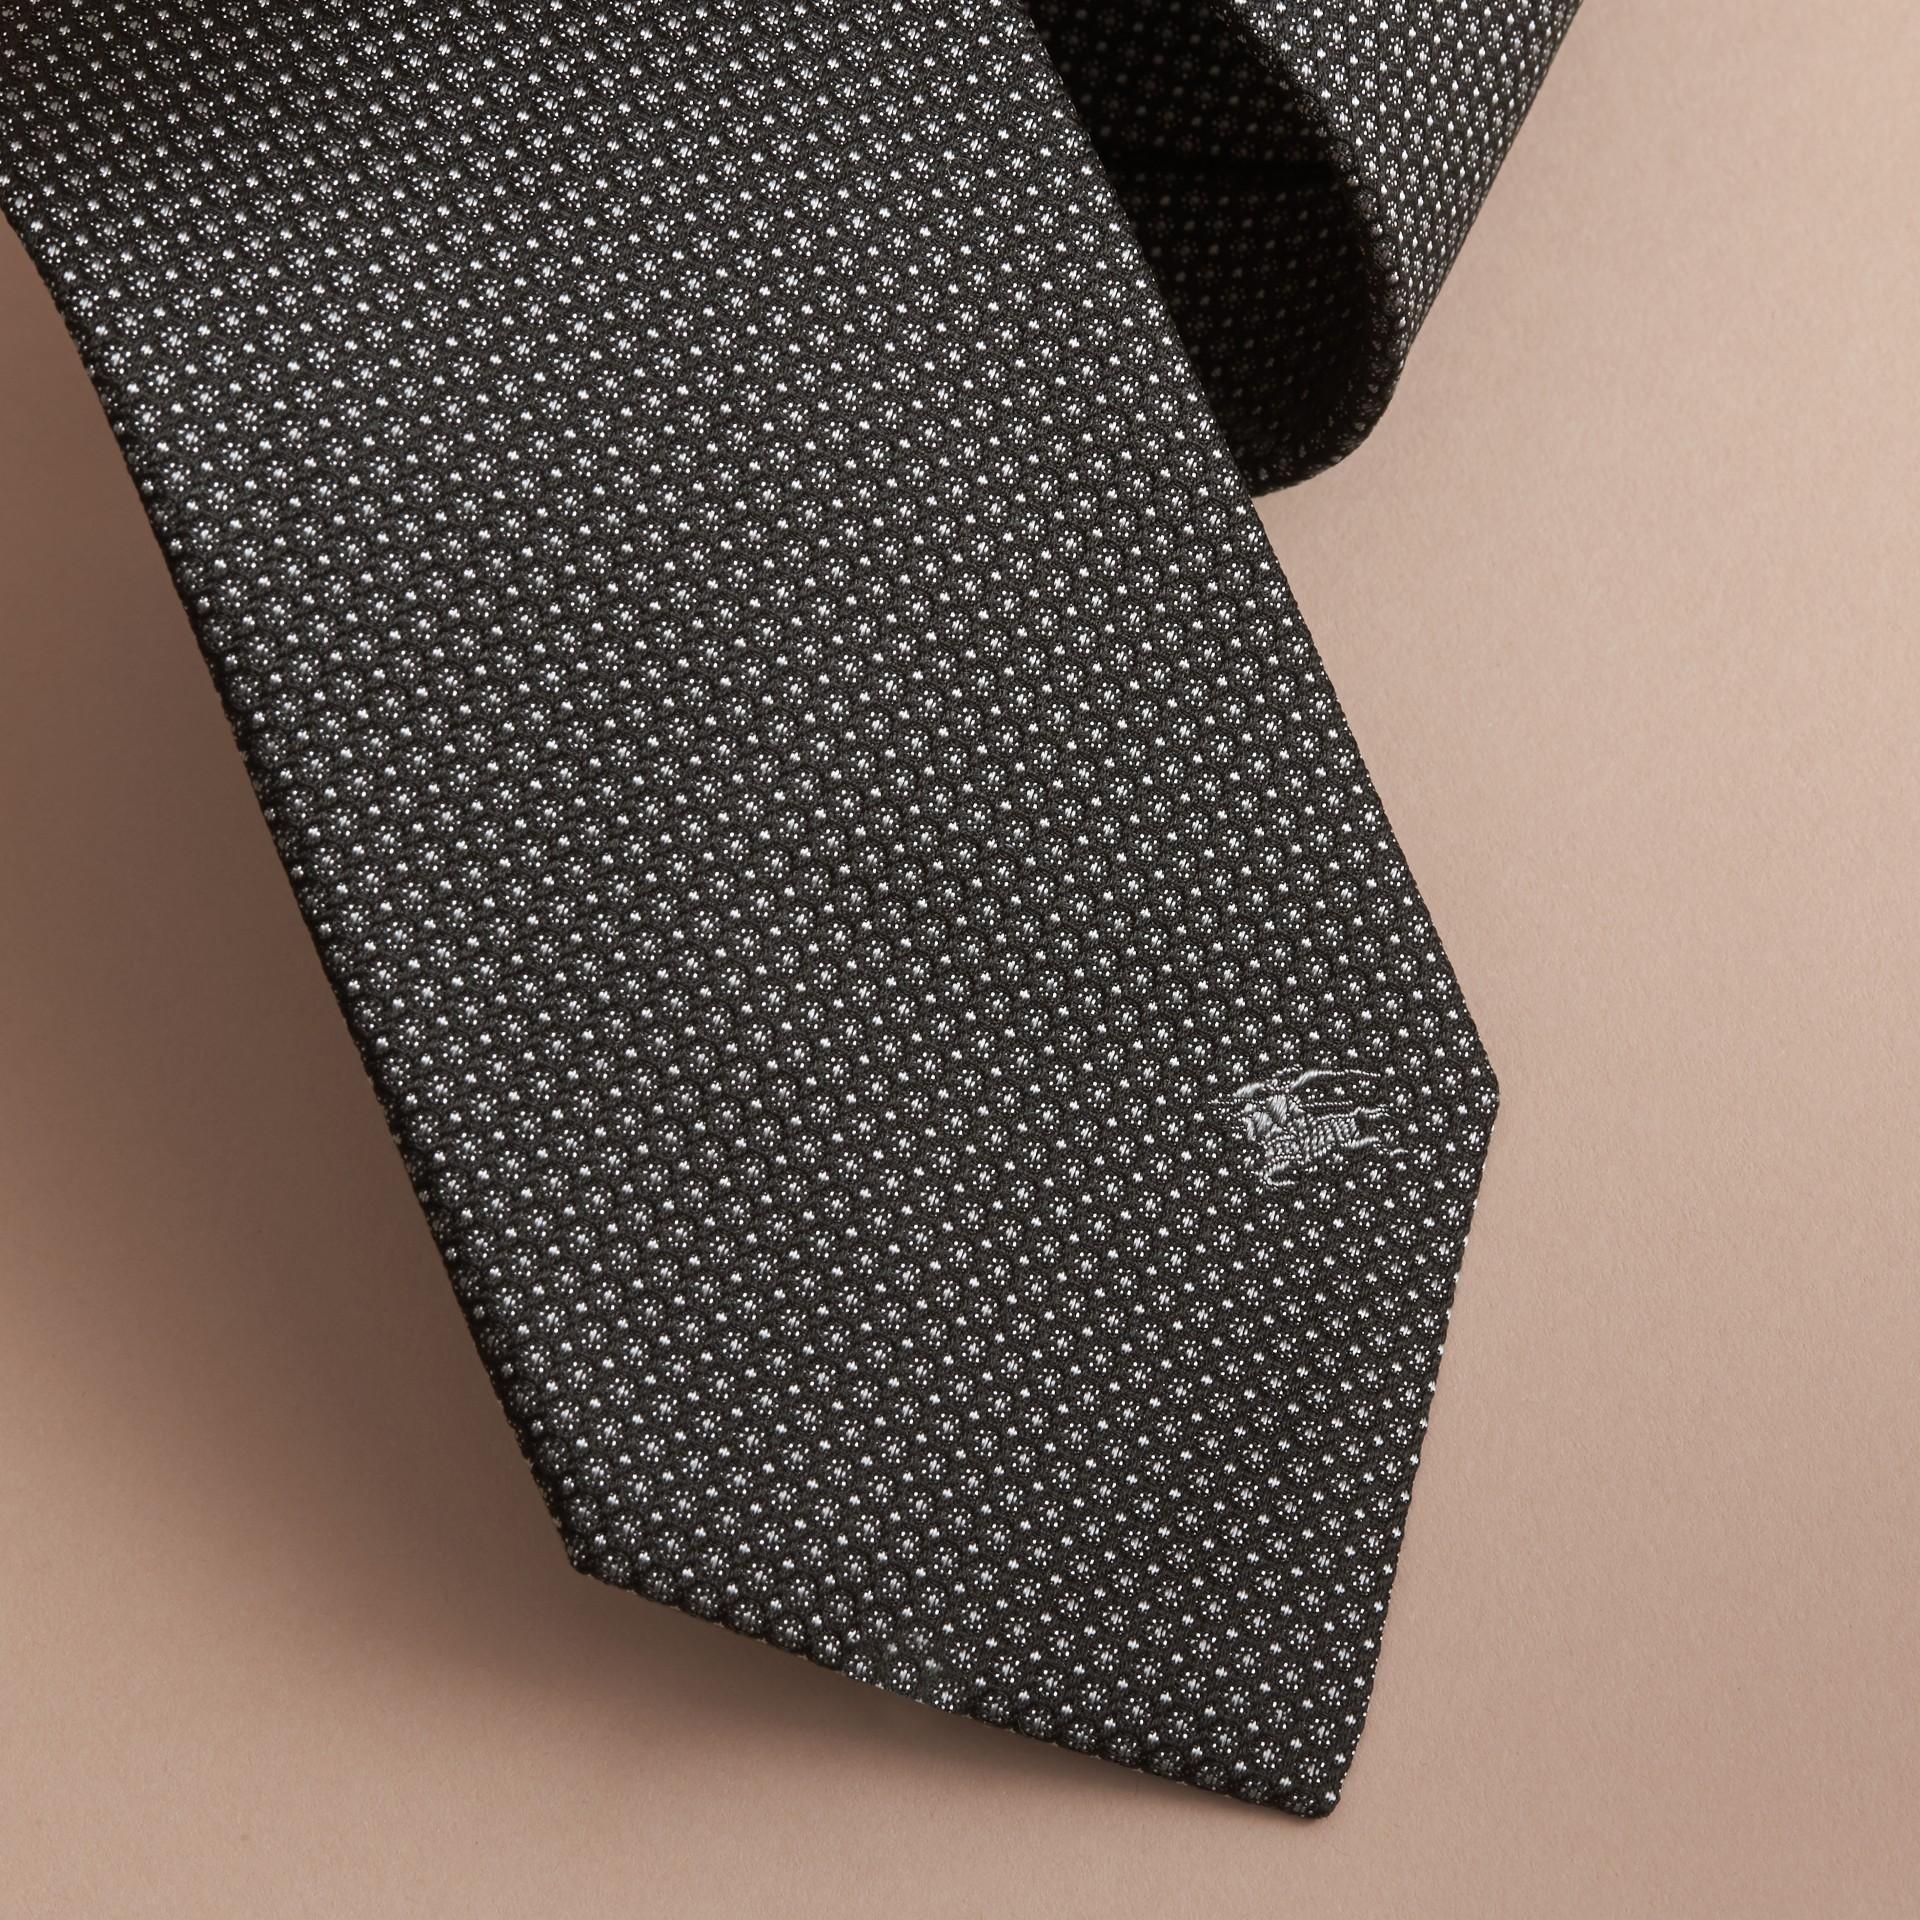 Classic Cut Patterned Silk Tie in Black - Men | Burberry Australia - gallery image 2